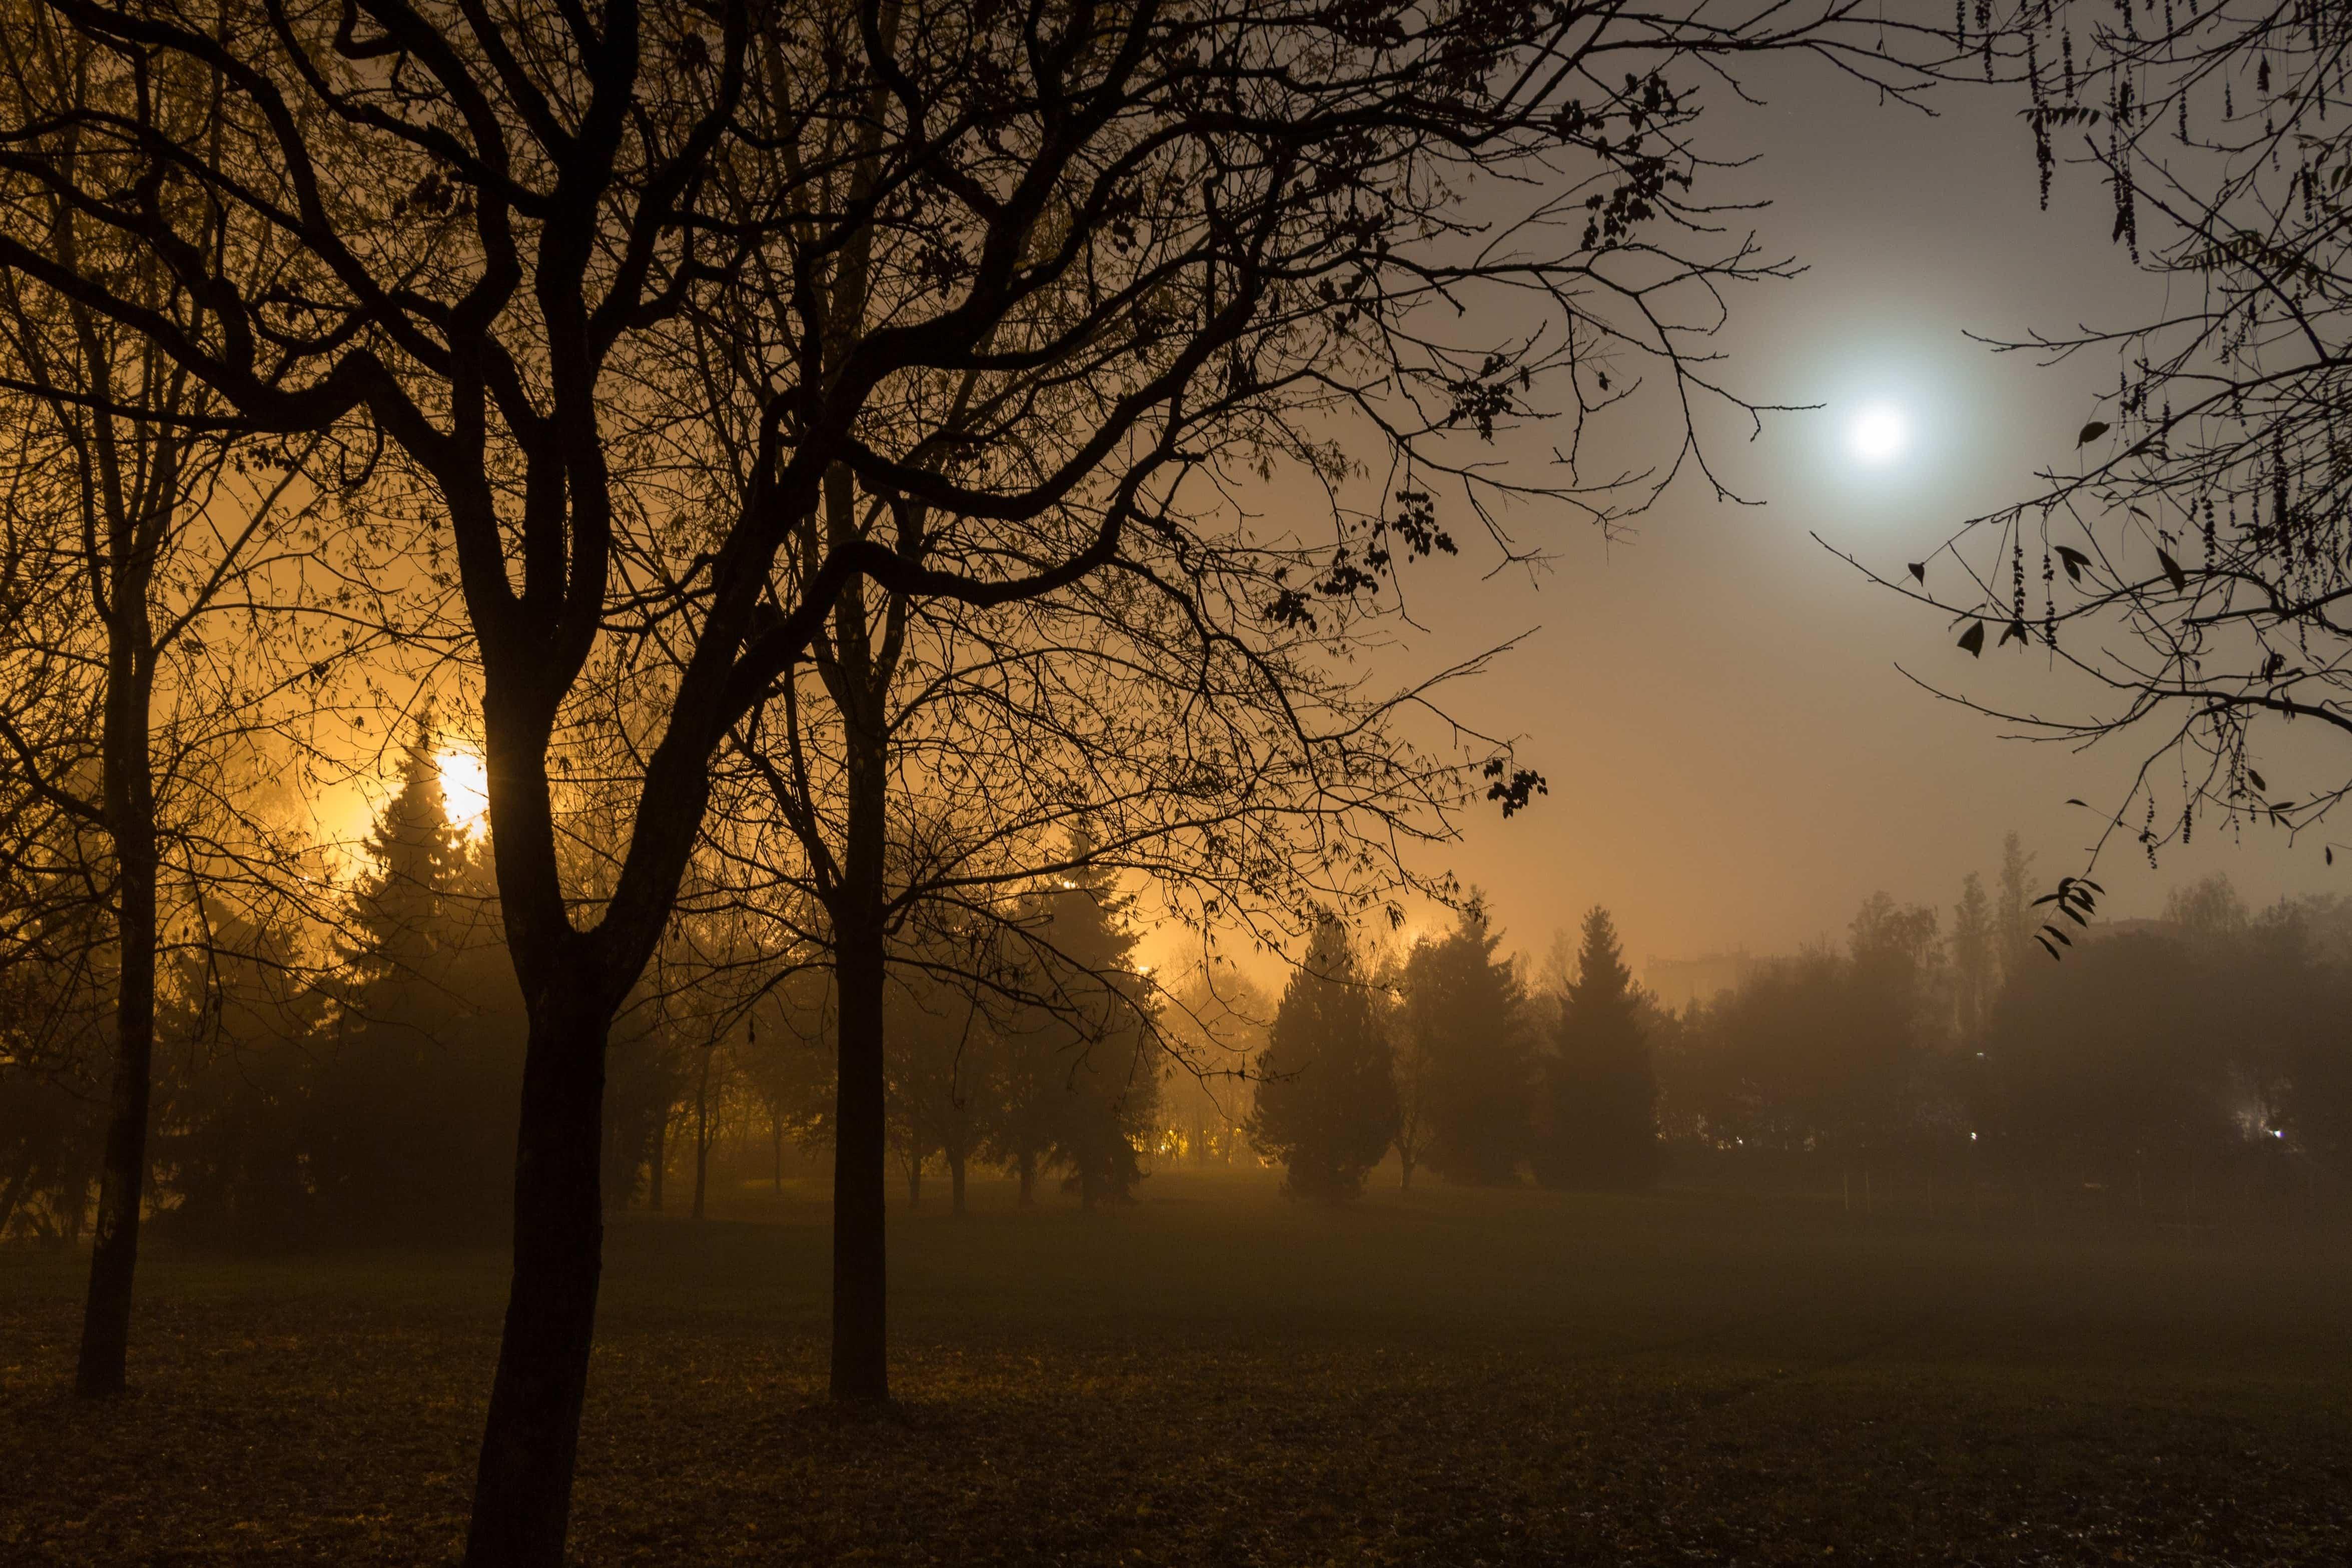 Fall Landscape Free Wallpaper Free Picture Silhouette Tree Dawn Sun Landscape Fog